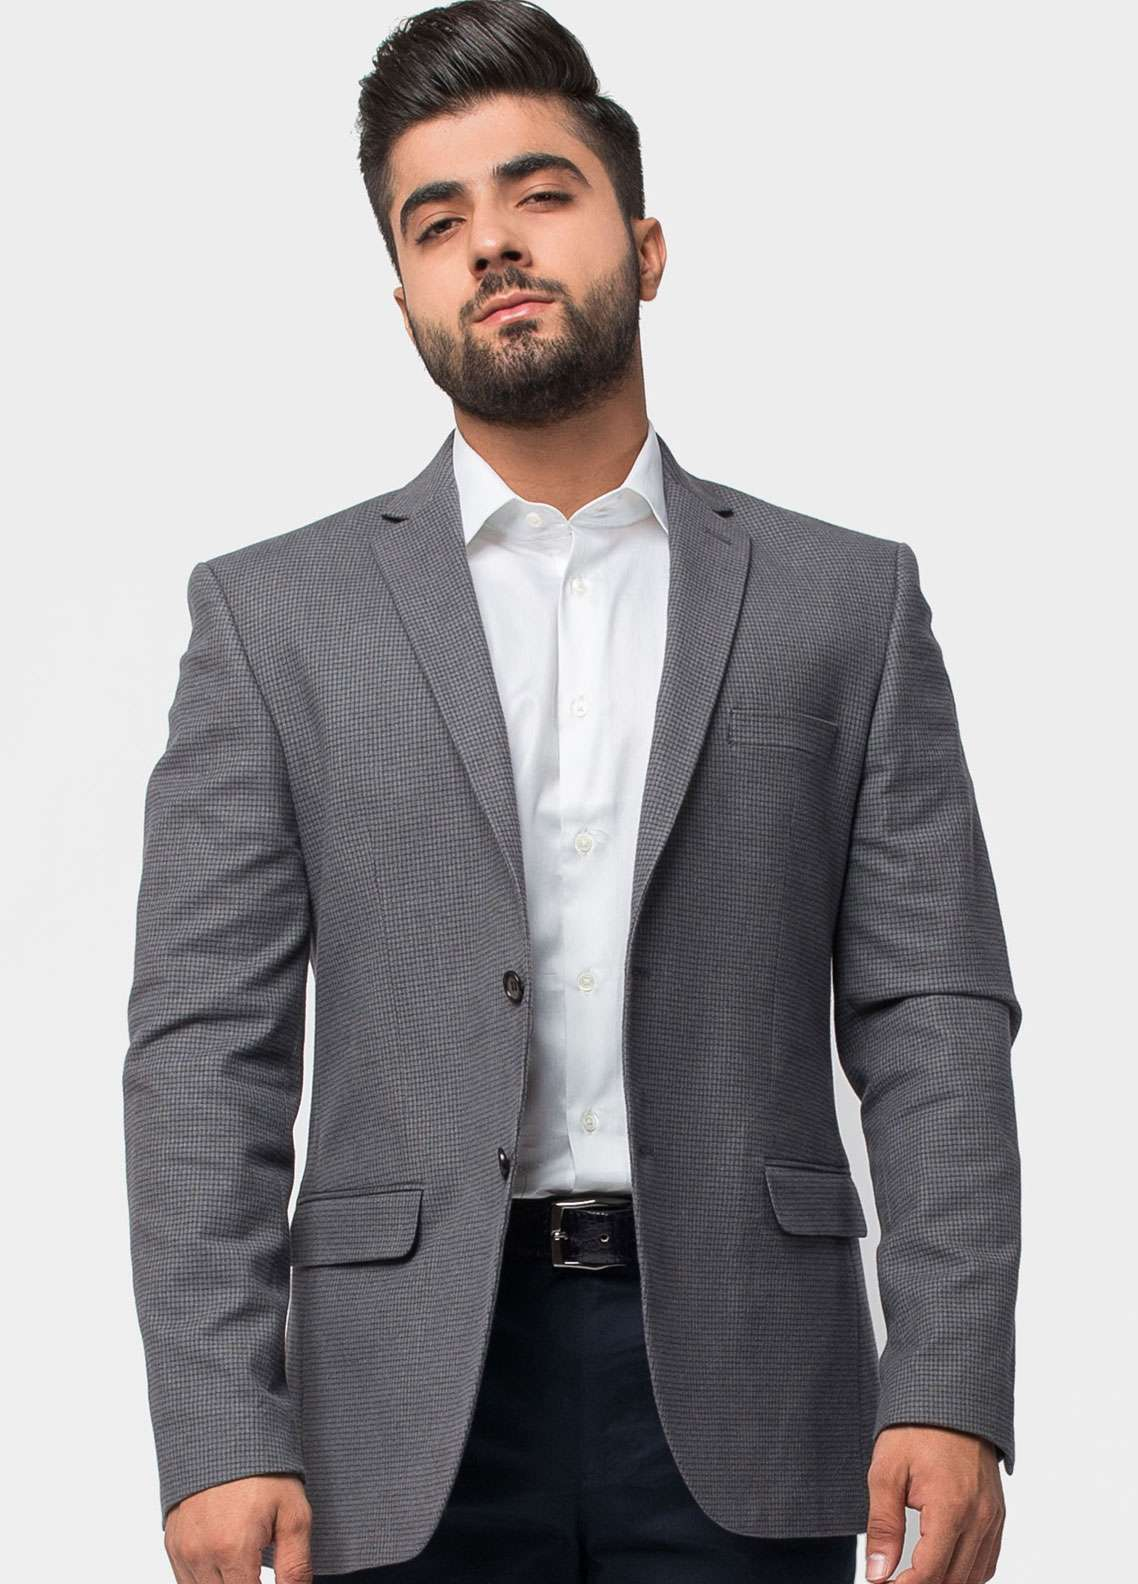 Brumano Cotton Casual Men Blazer - Grey BLZ-518